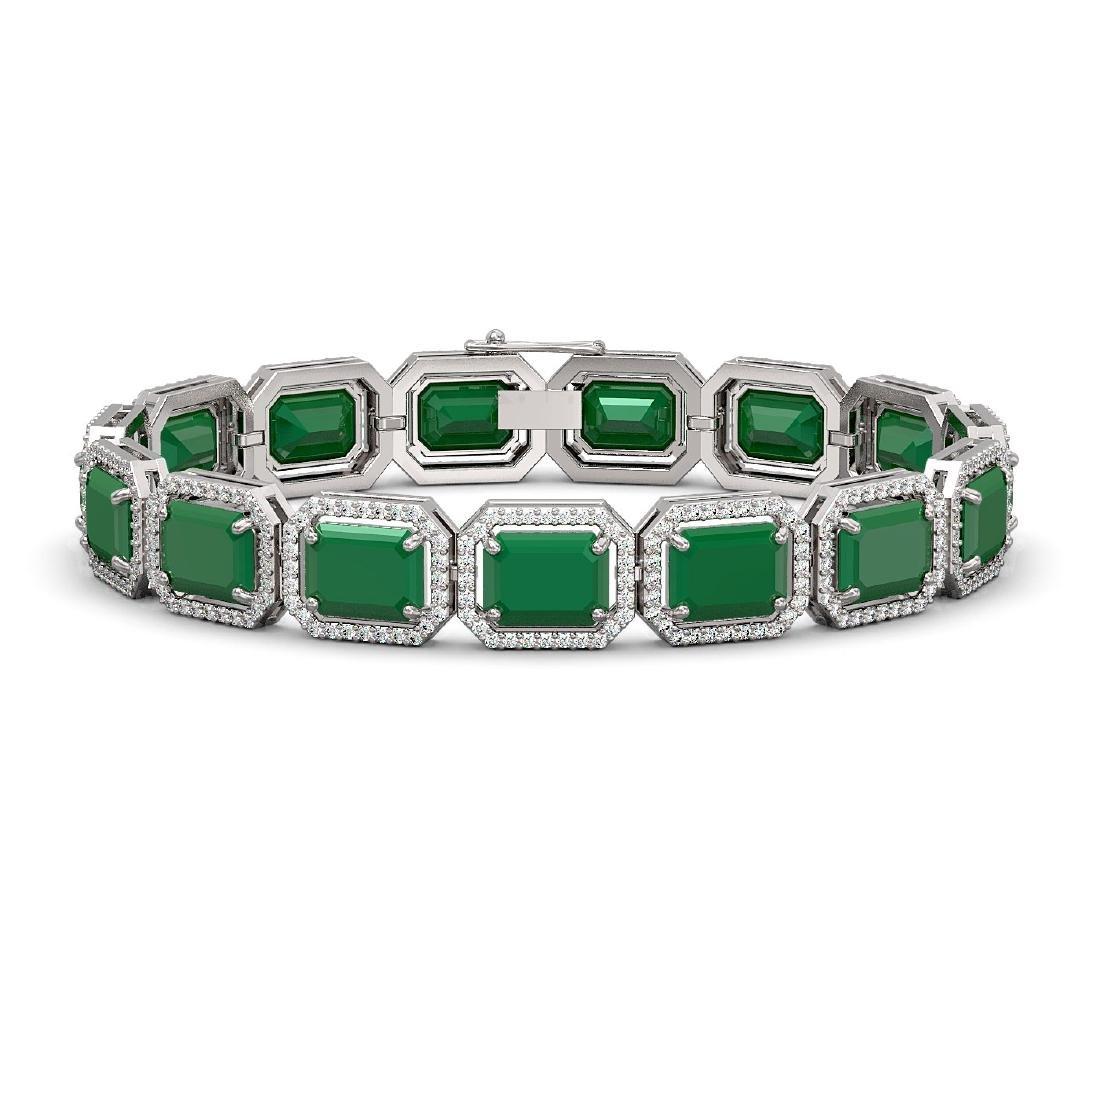 38.61 CTW Emerald & Diamond Halo Bracelet 10K White